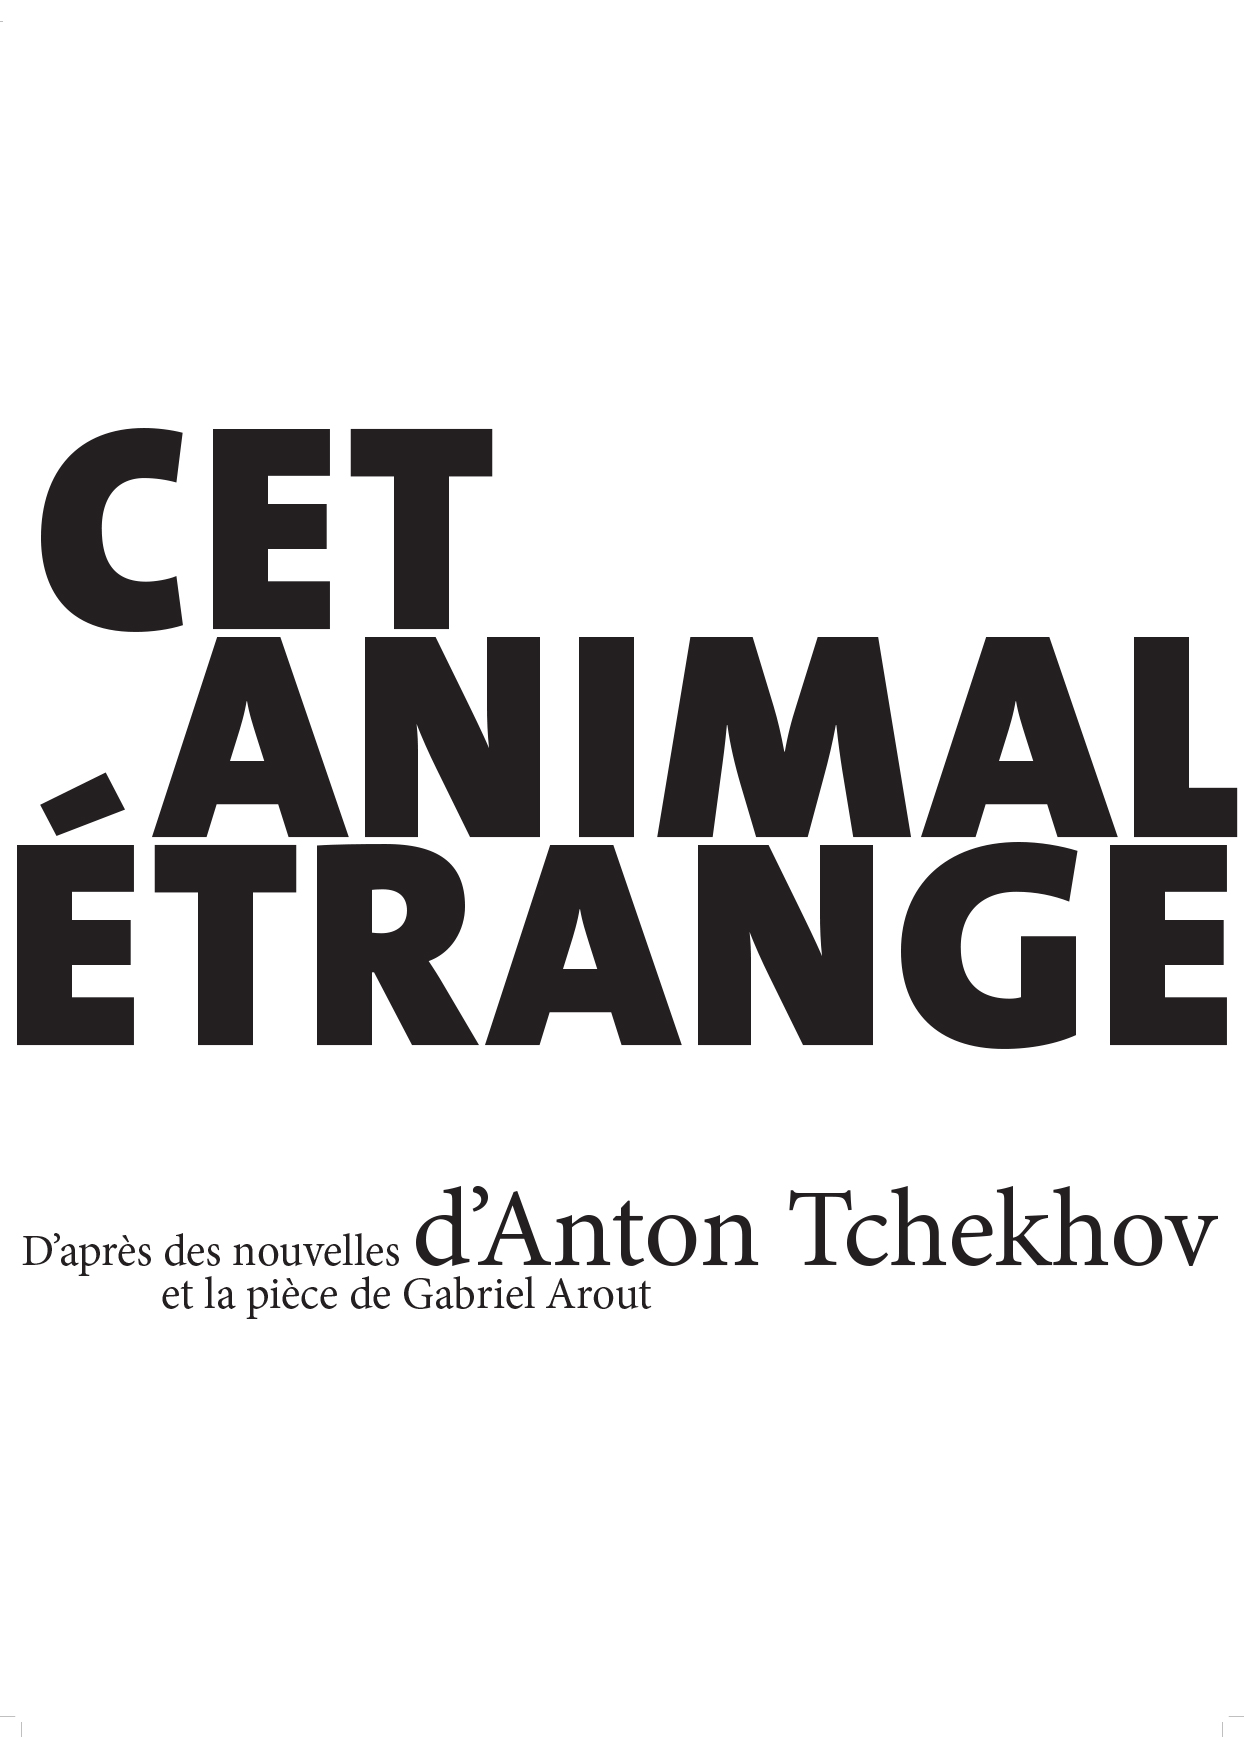 Affiche Cet etrange animal